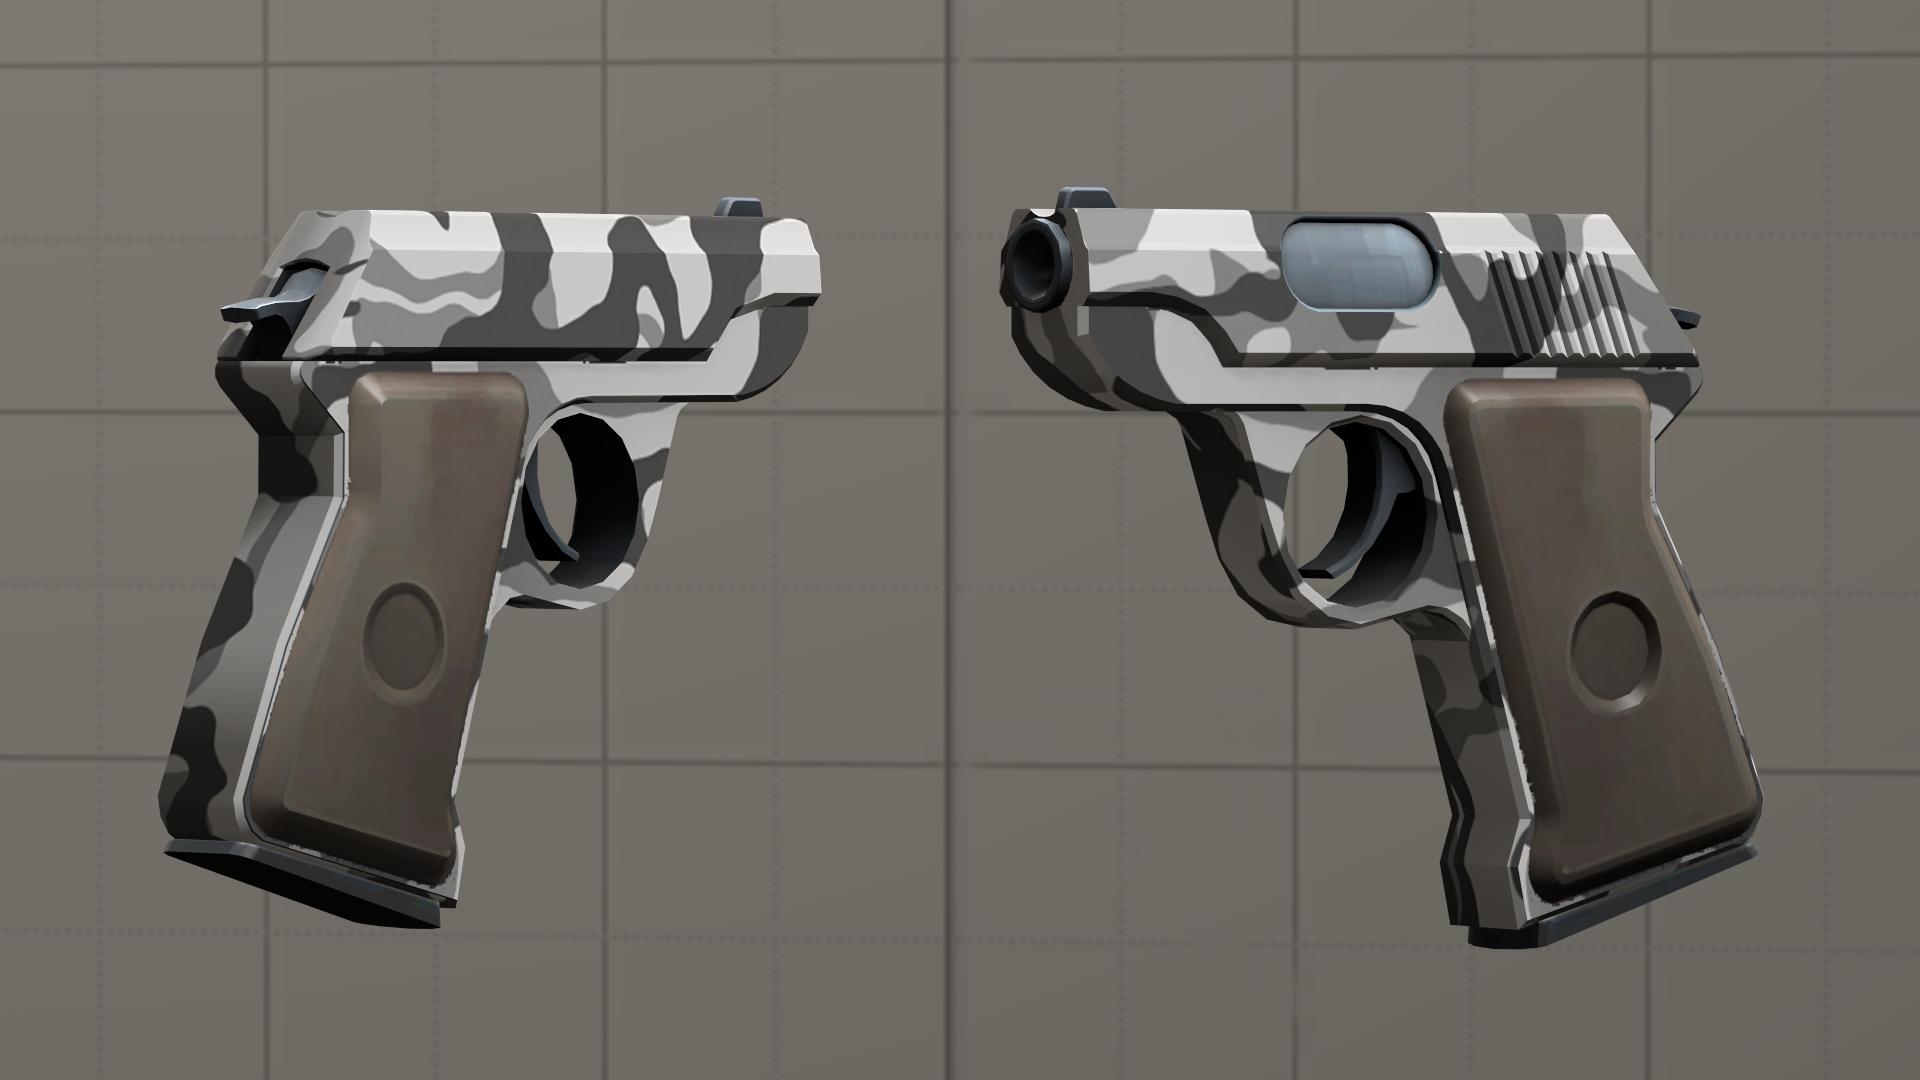 Urban camo pistol [DL] by Nikolad92